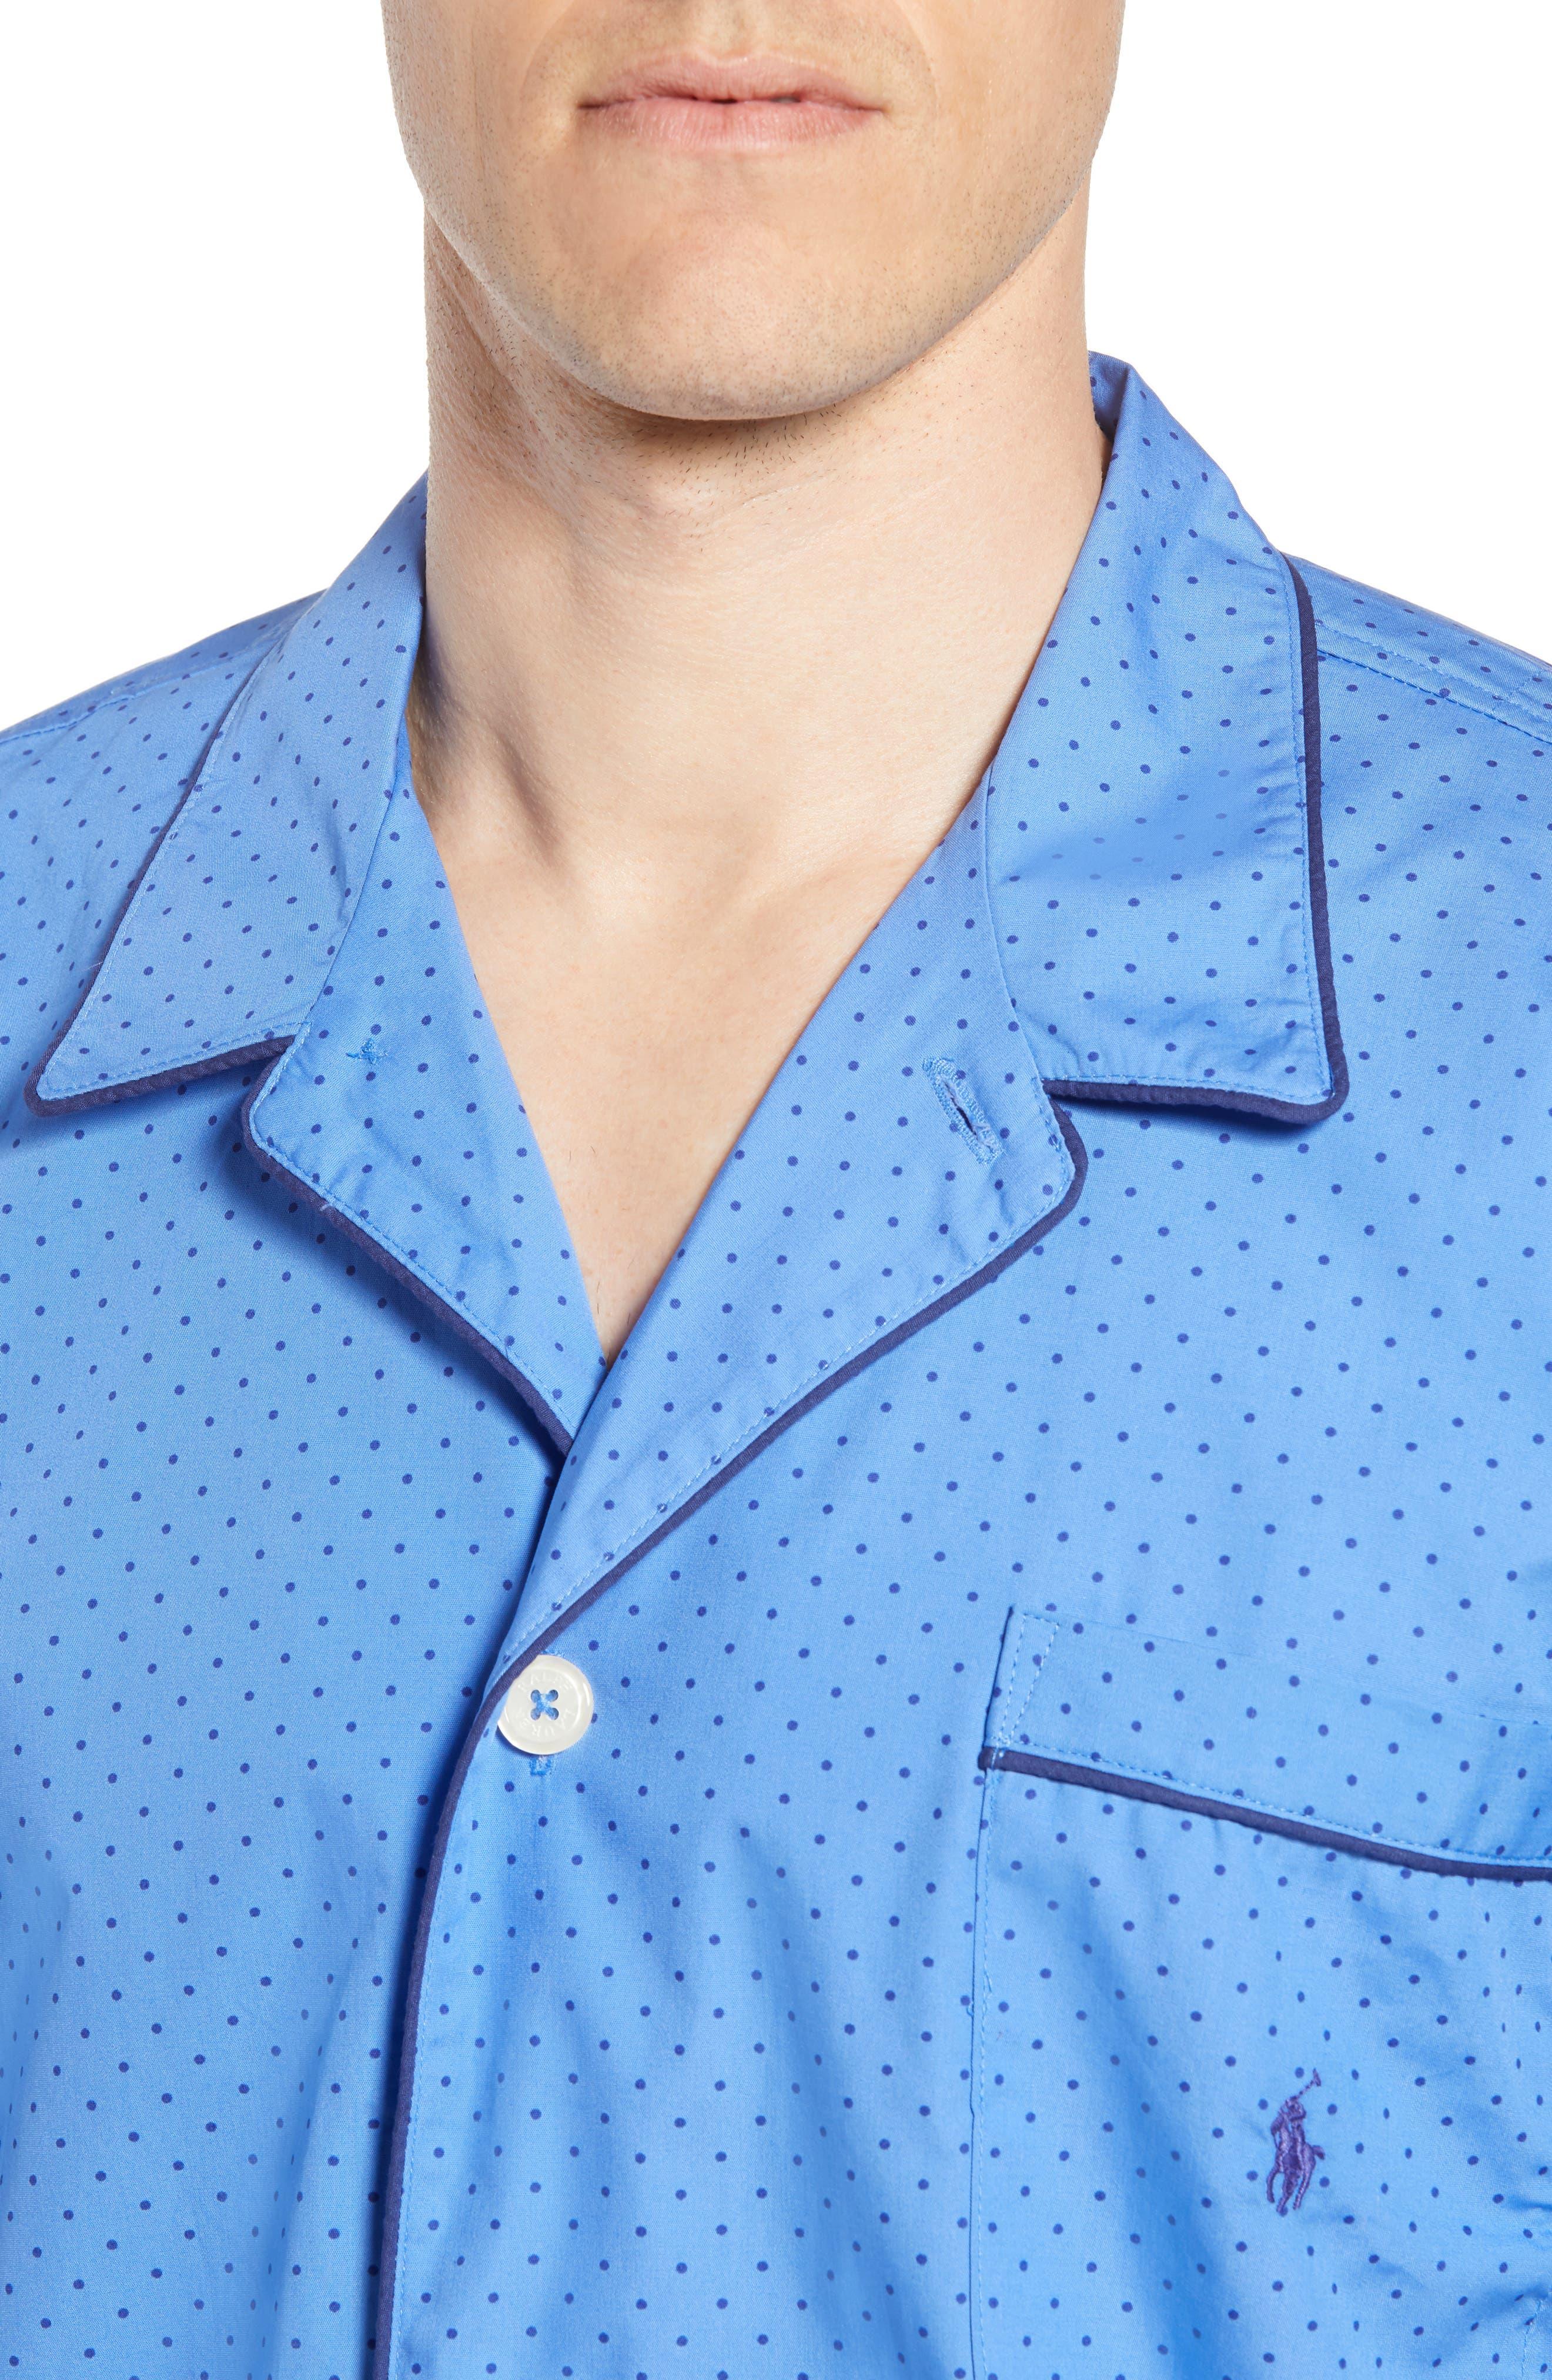 Dot Cotton Pajama Shirt,                             Alternate thumbnail 4, color,                             Harbour Island Blue/ Navy